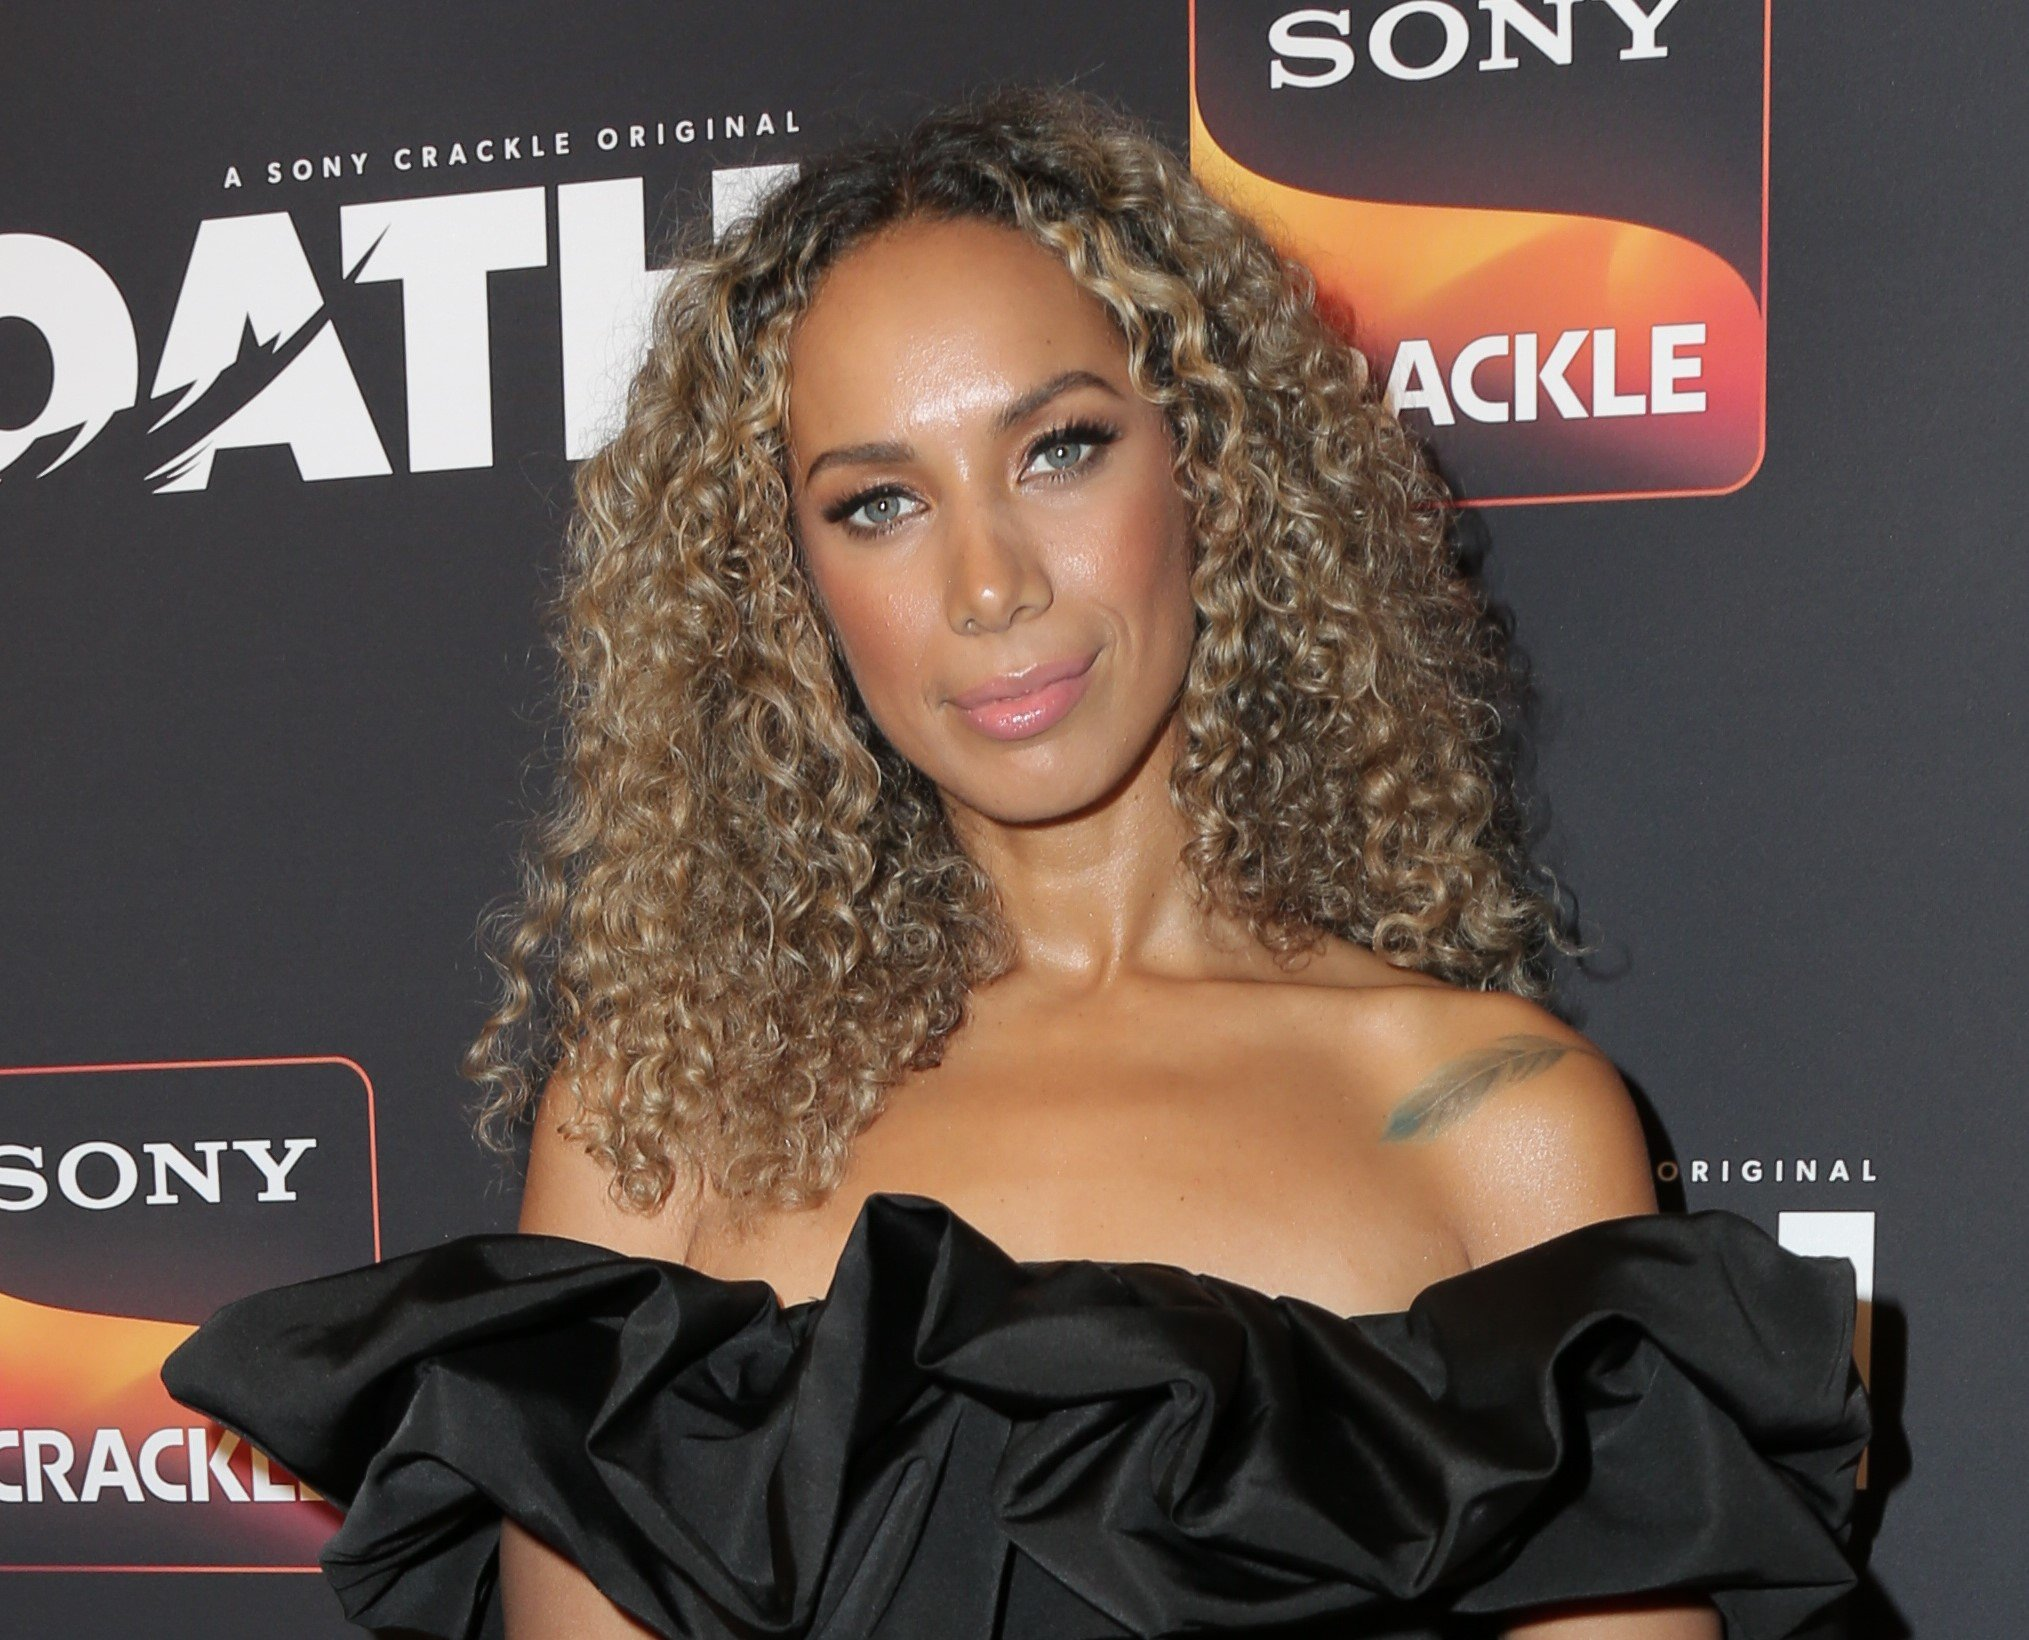 X Factor star Leona Lewis shares stunning pics from Italian honeymoon